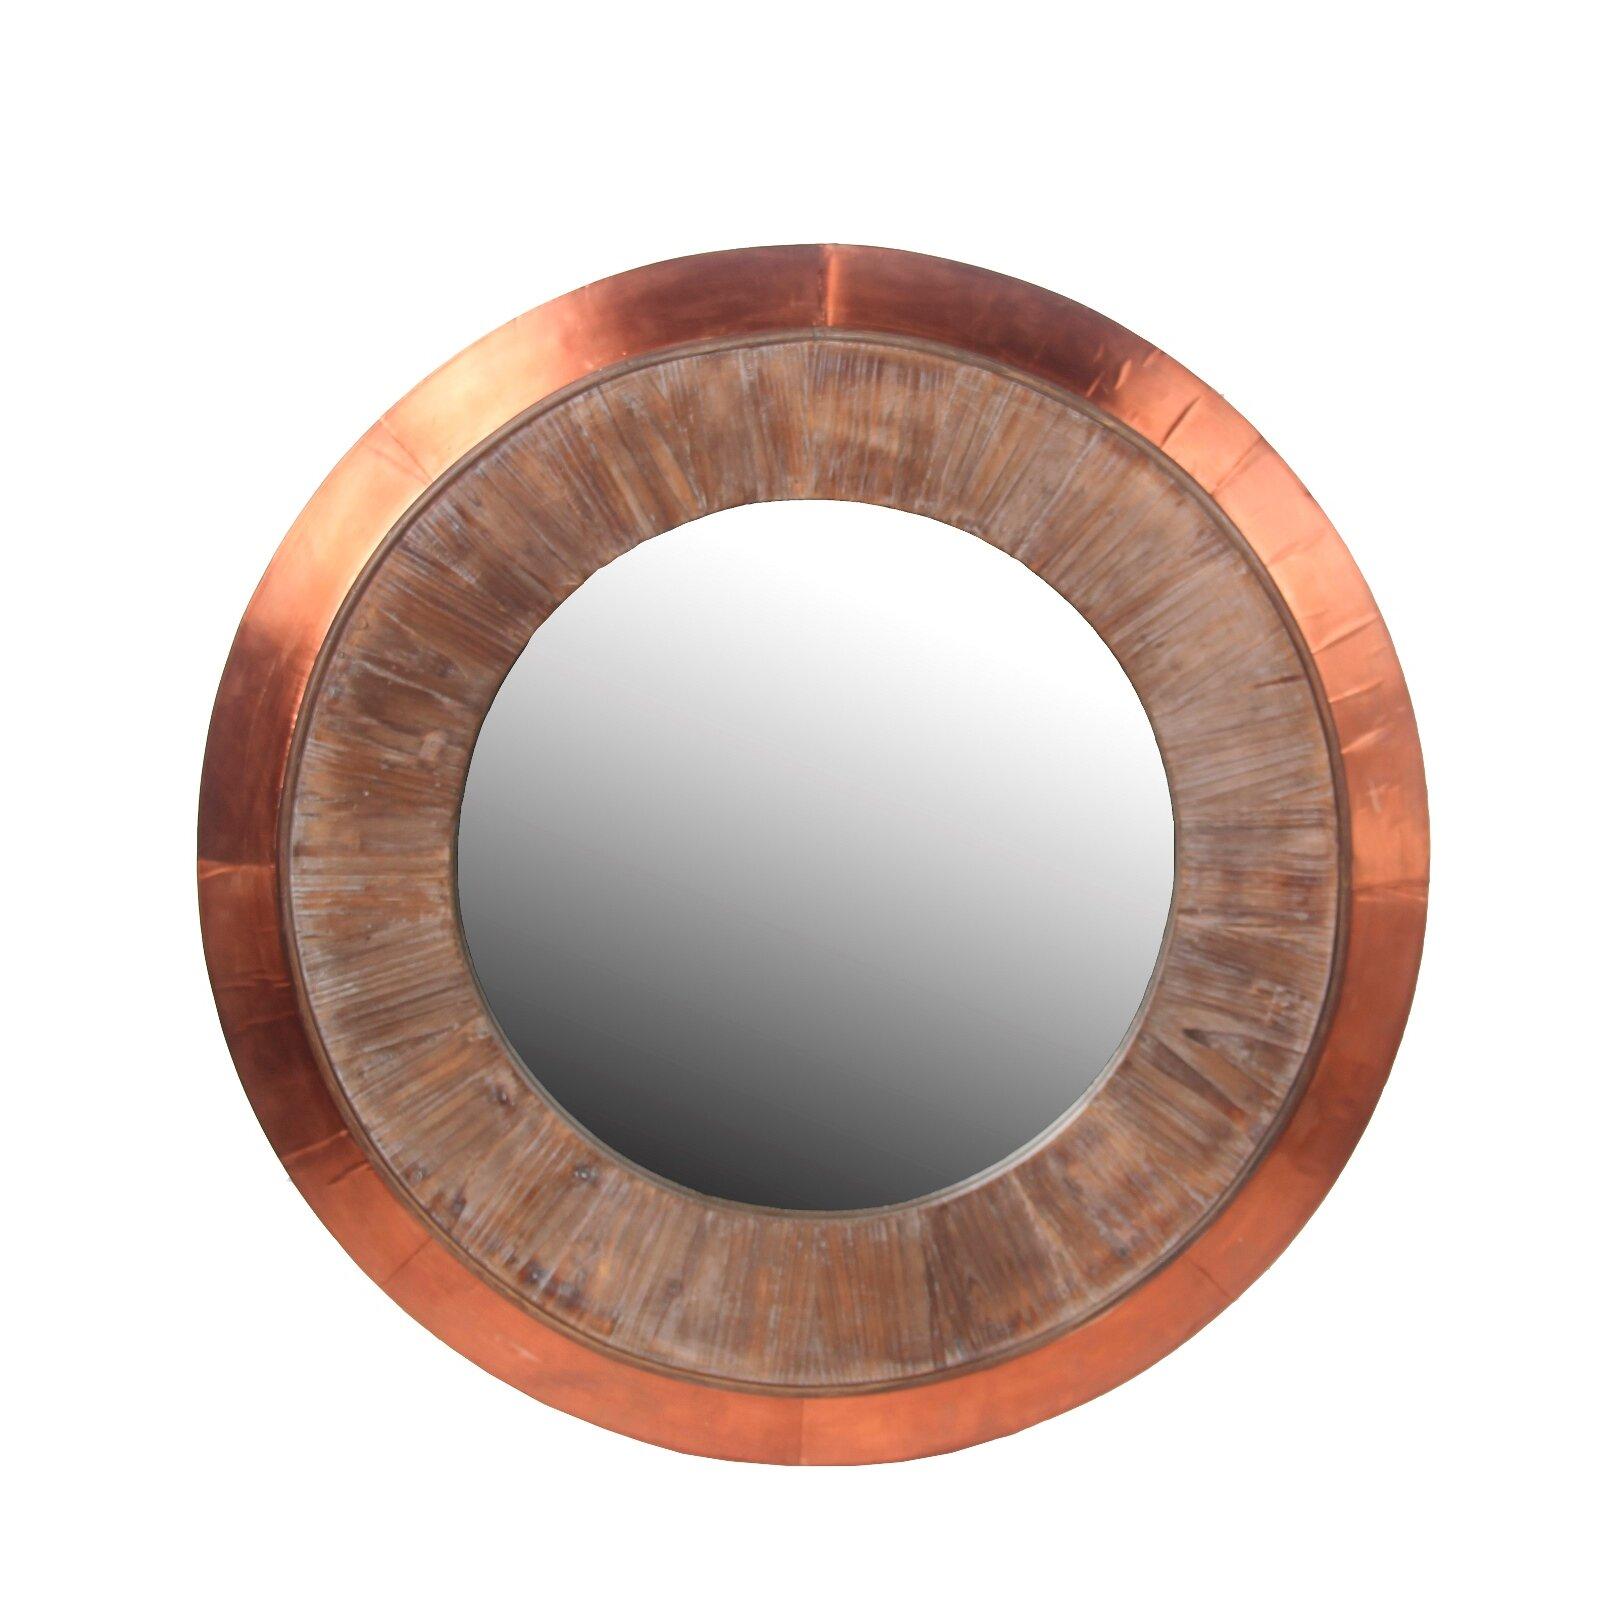 Privilege Wood Amp Copper Round Wall Mirror Amp Reviews Wayfair